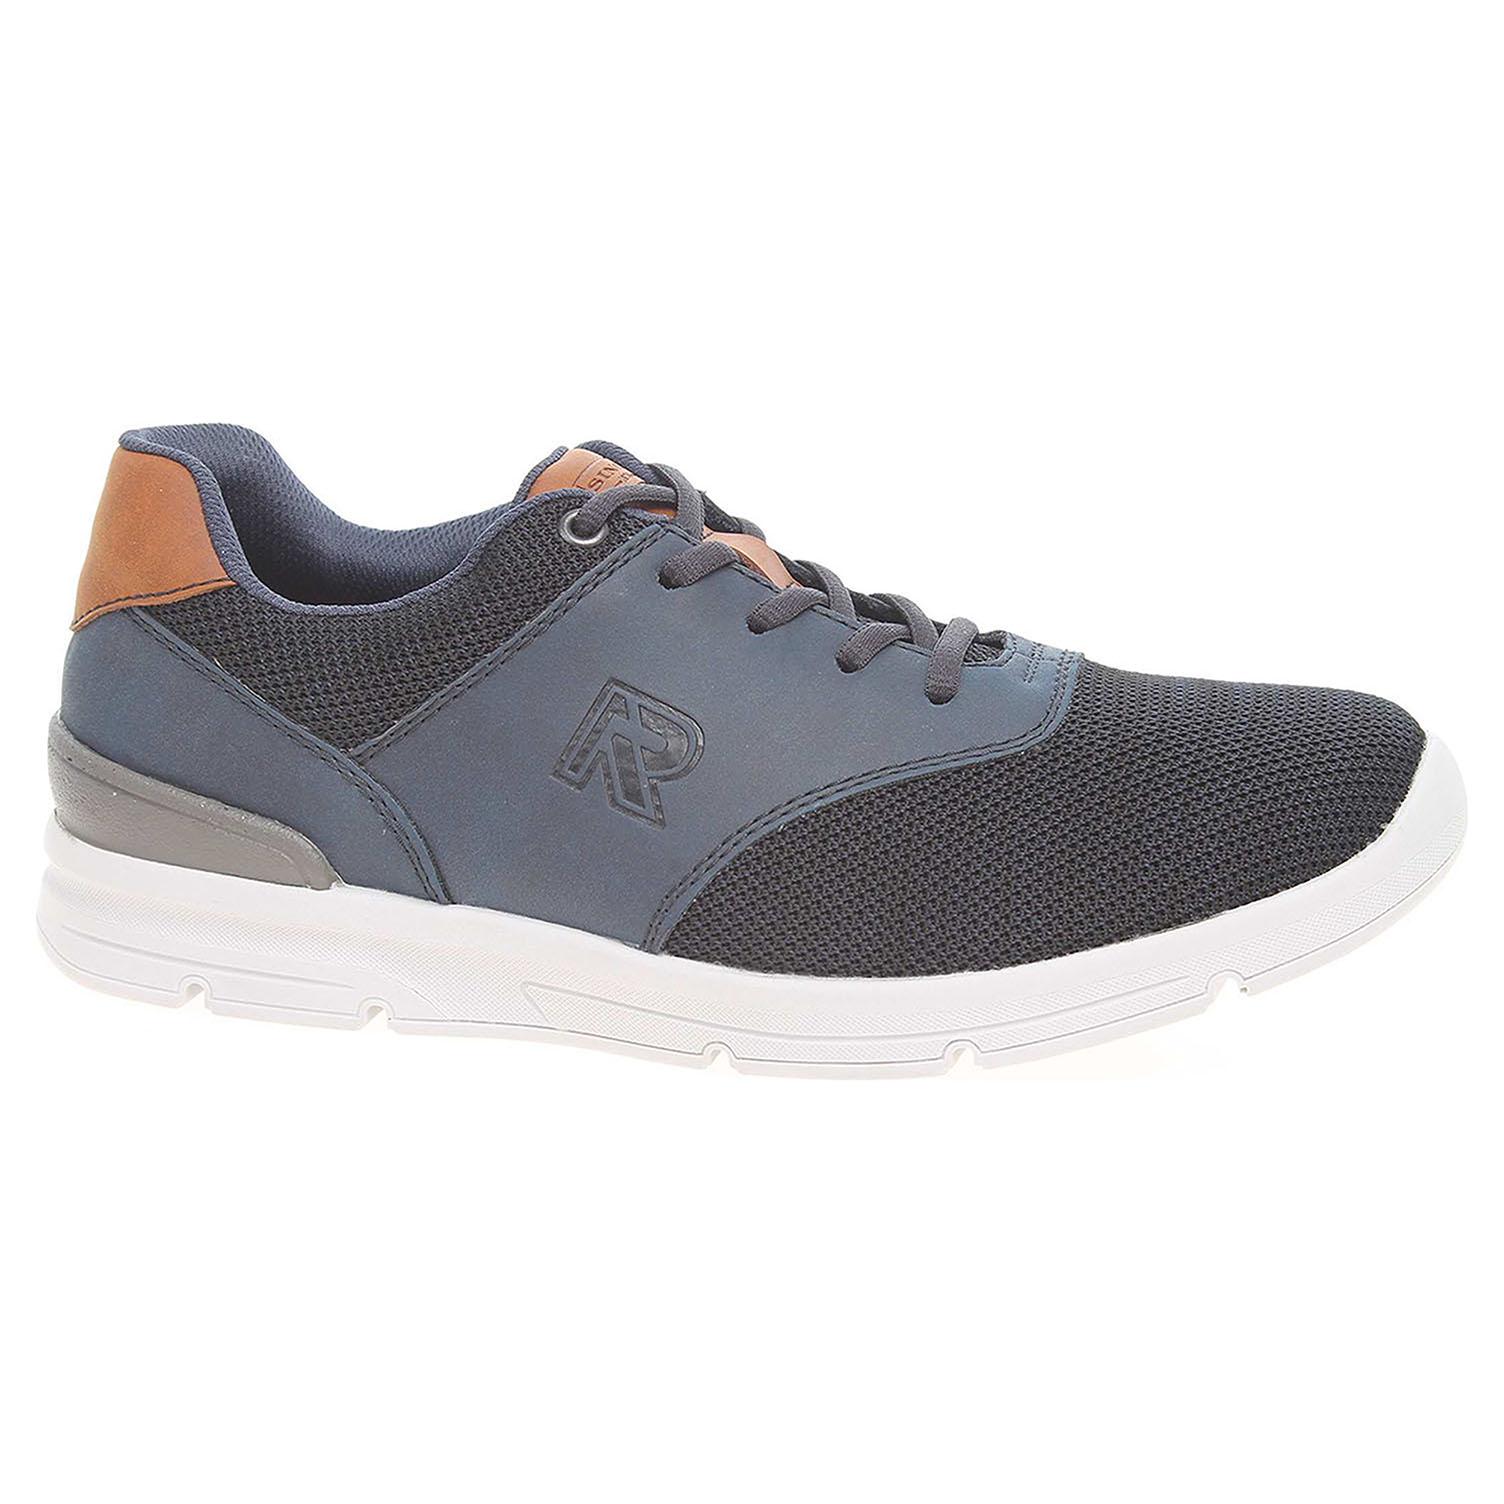 Pánská obuv Rieker 16400-00 schwarz 16400-00 41